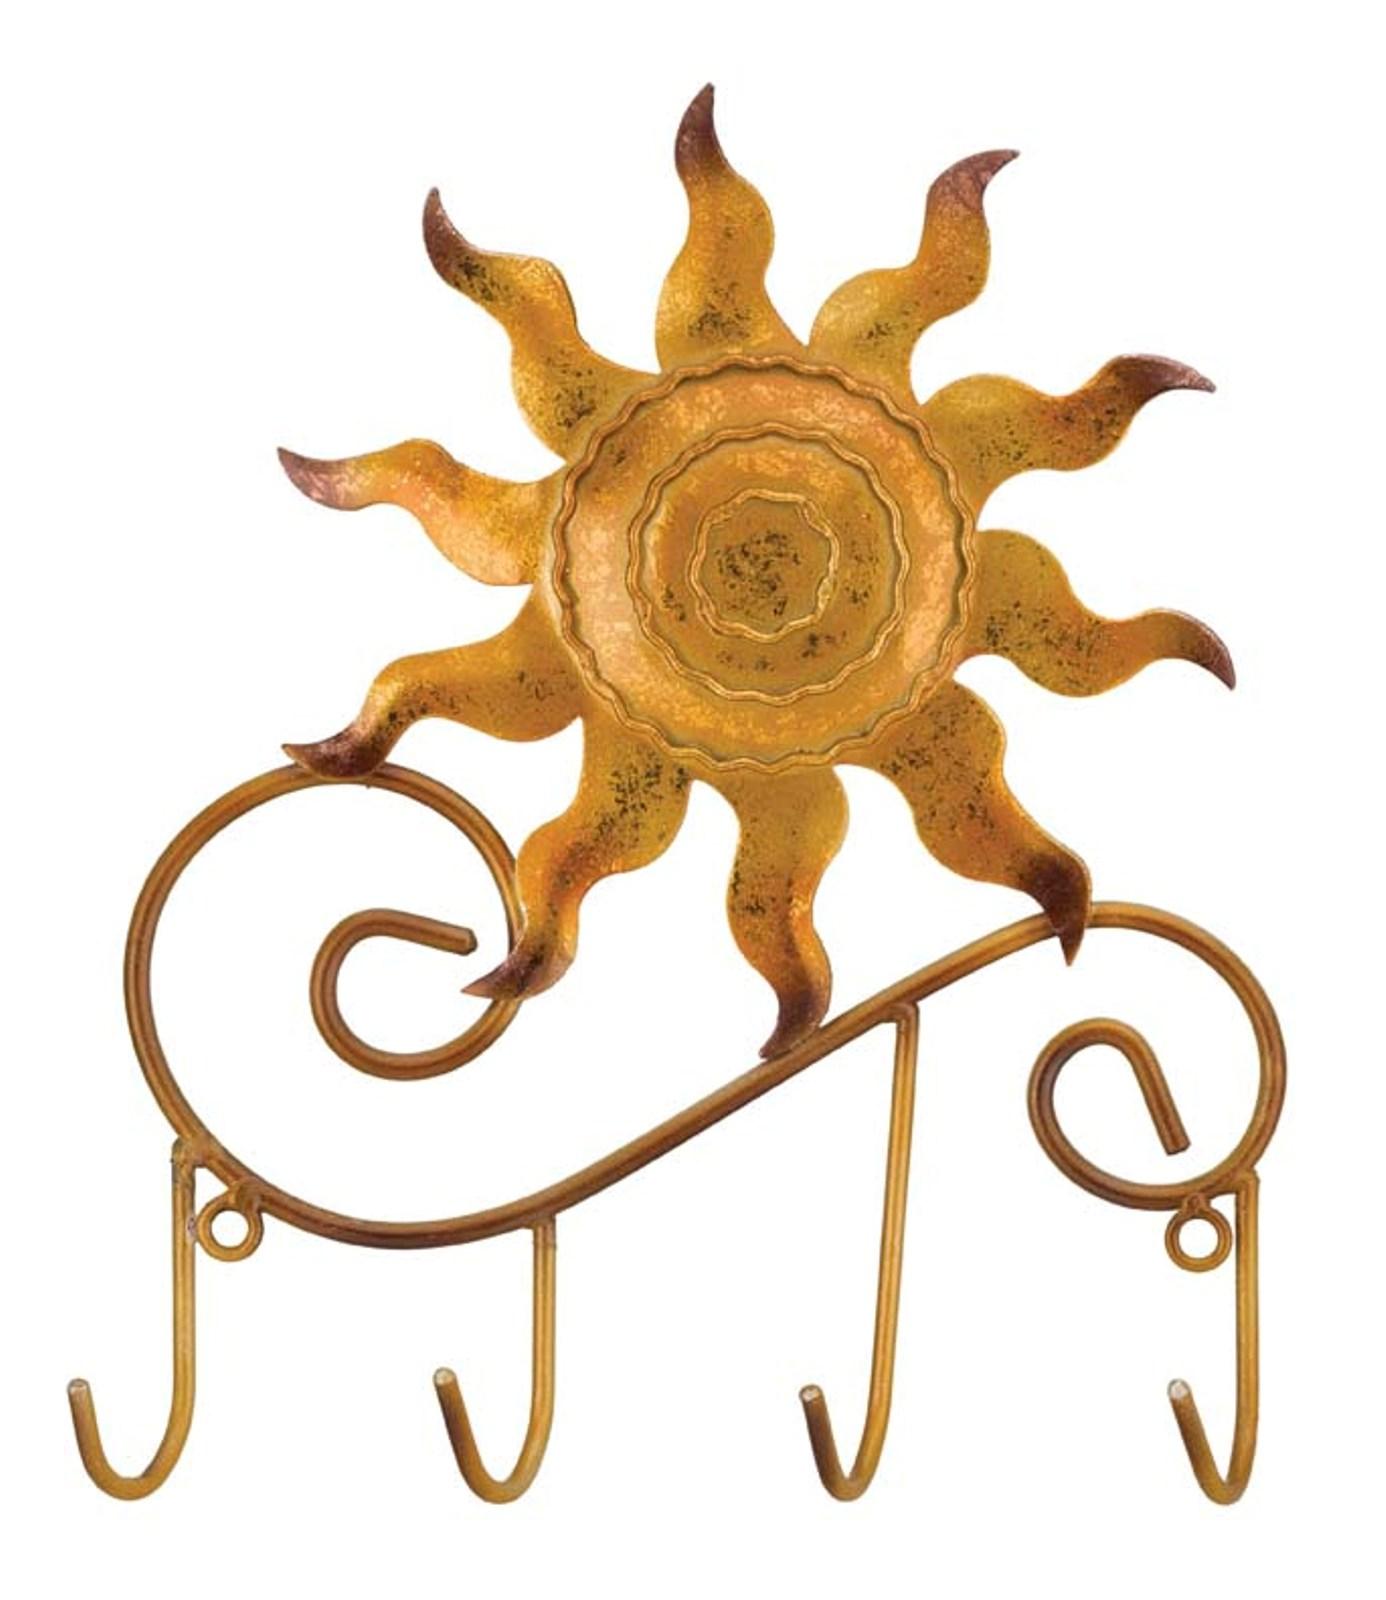 Yellow Sun Wall Decor : Coppery yellow sun metal key quad wall hooks decor regal